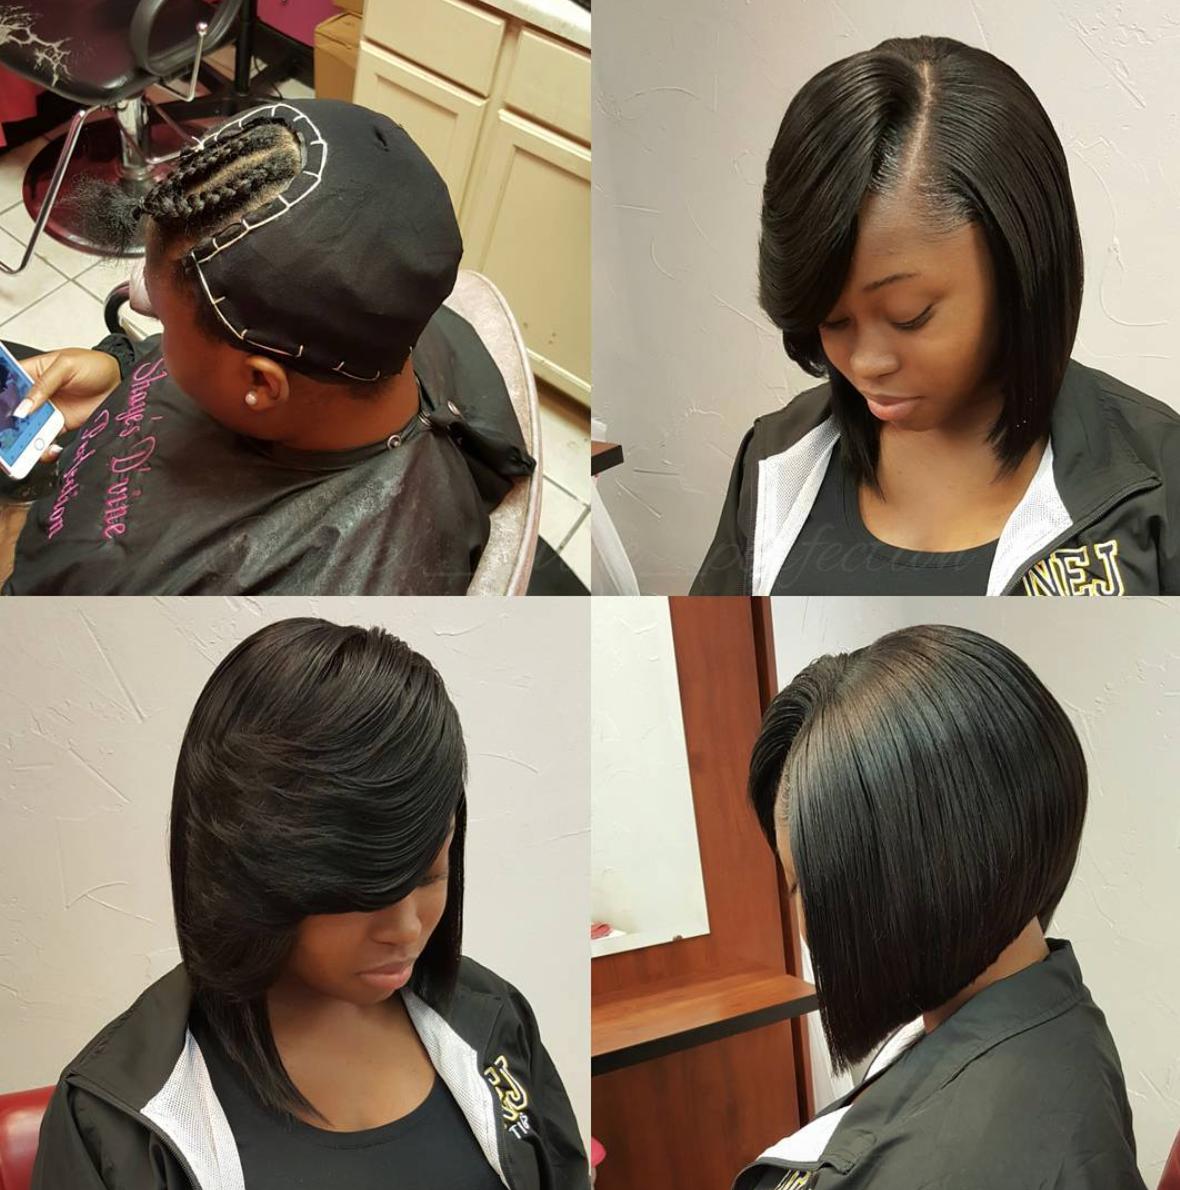 Nice Quick Weave Bob Via Shayes Dvine Perfection Black Hair Information Weave Bob Hairstyles Quick Weave Hairstyles Black Bob Hairstyles